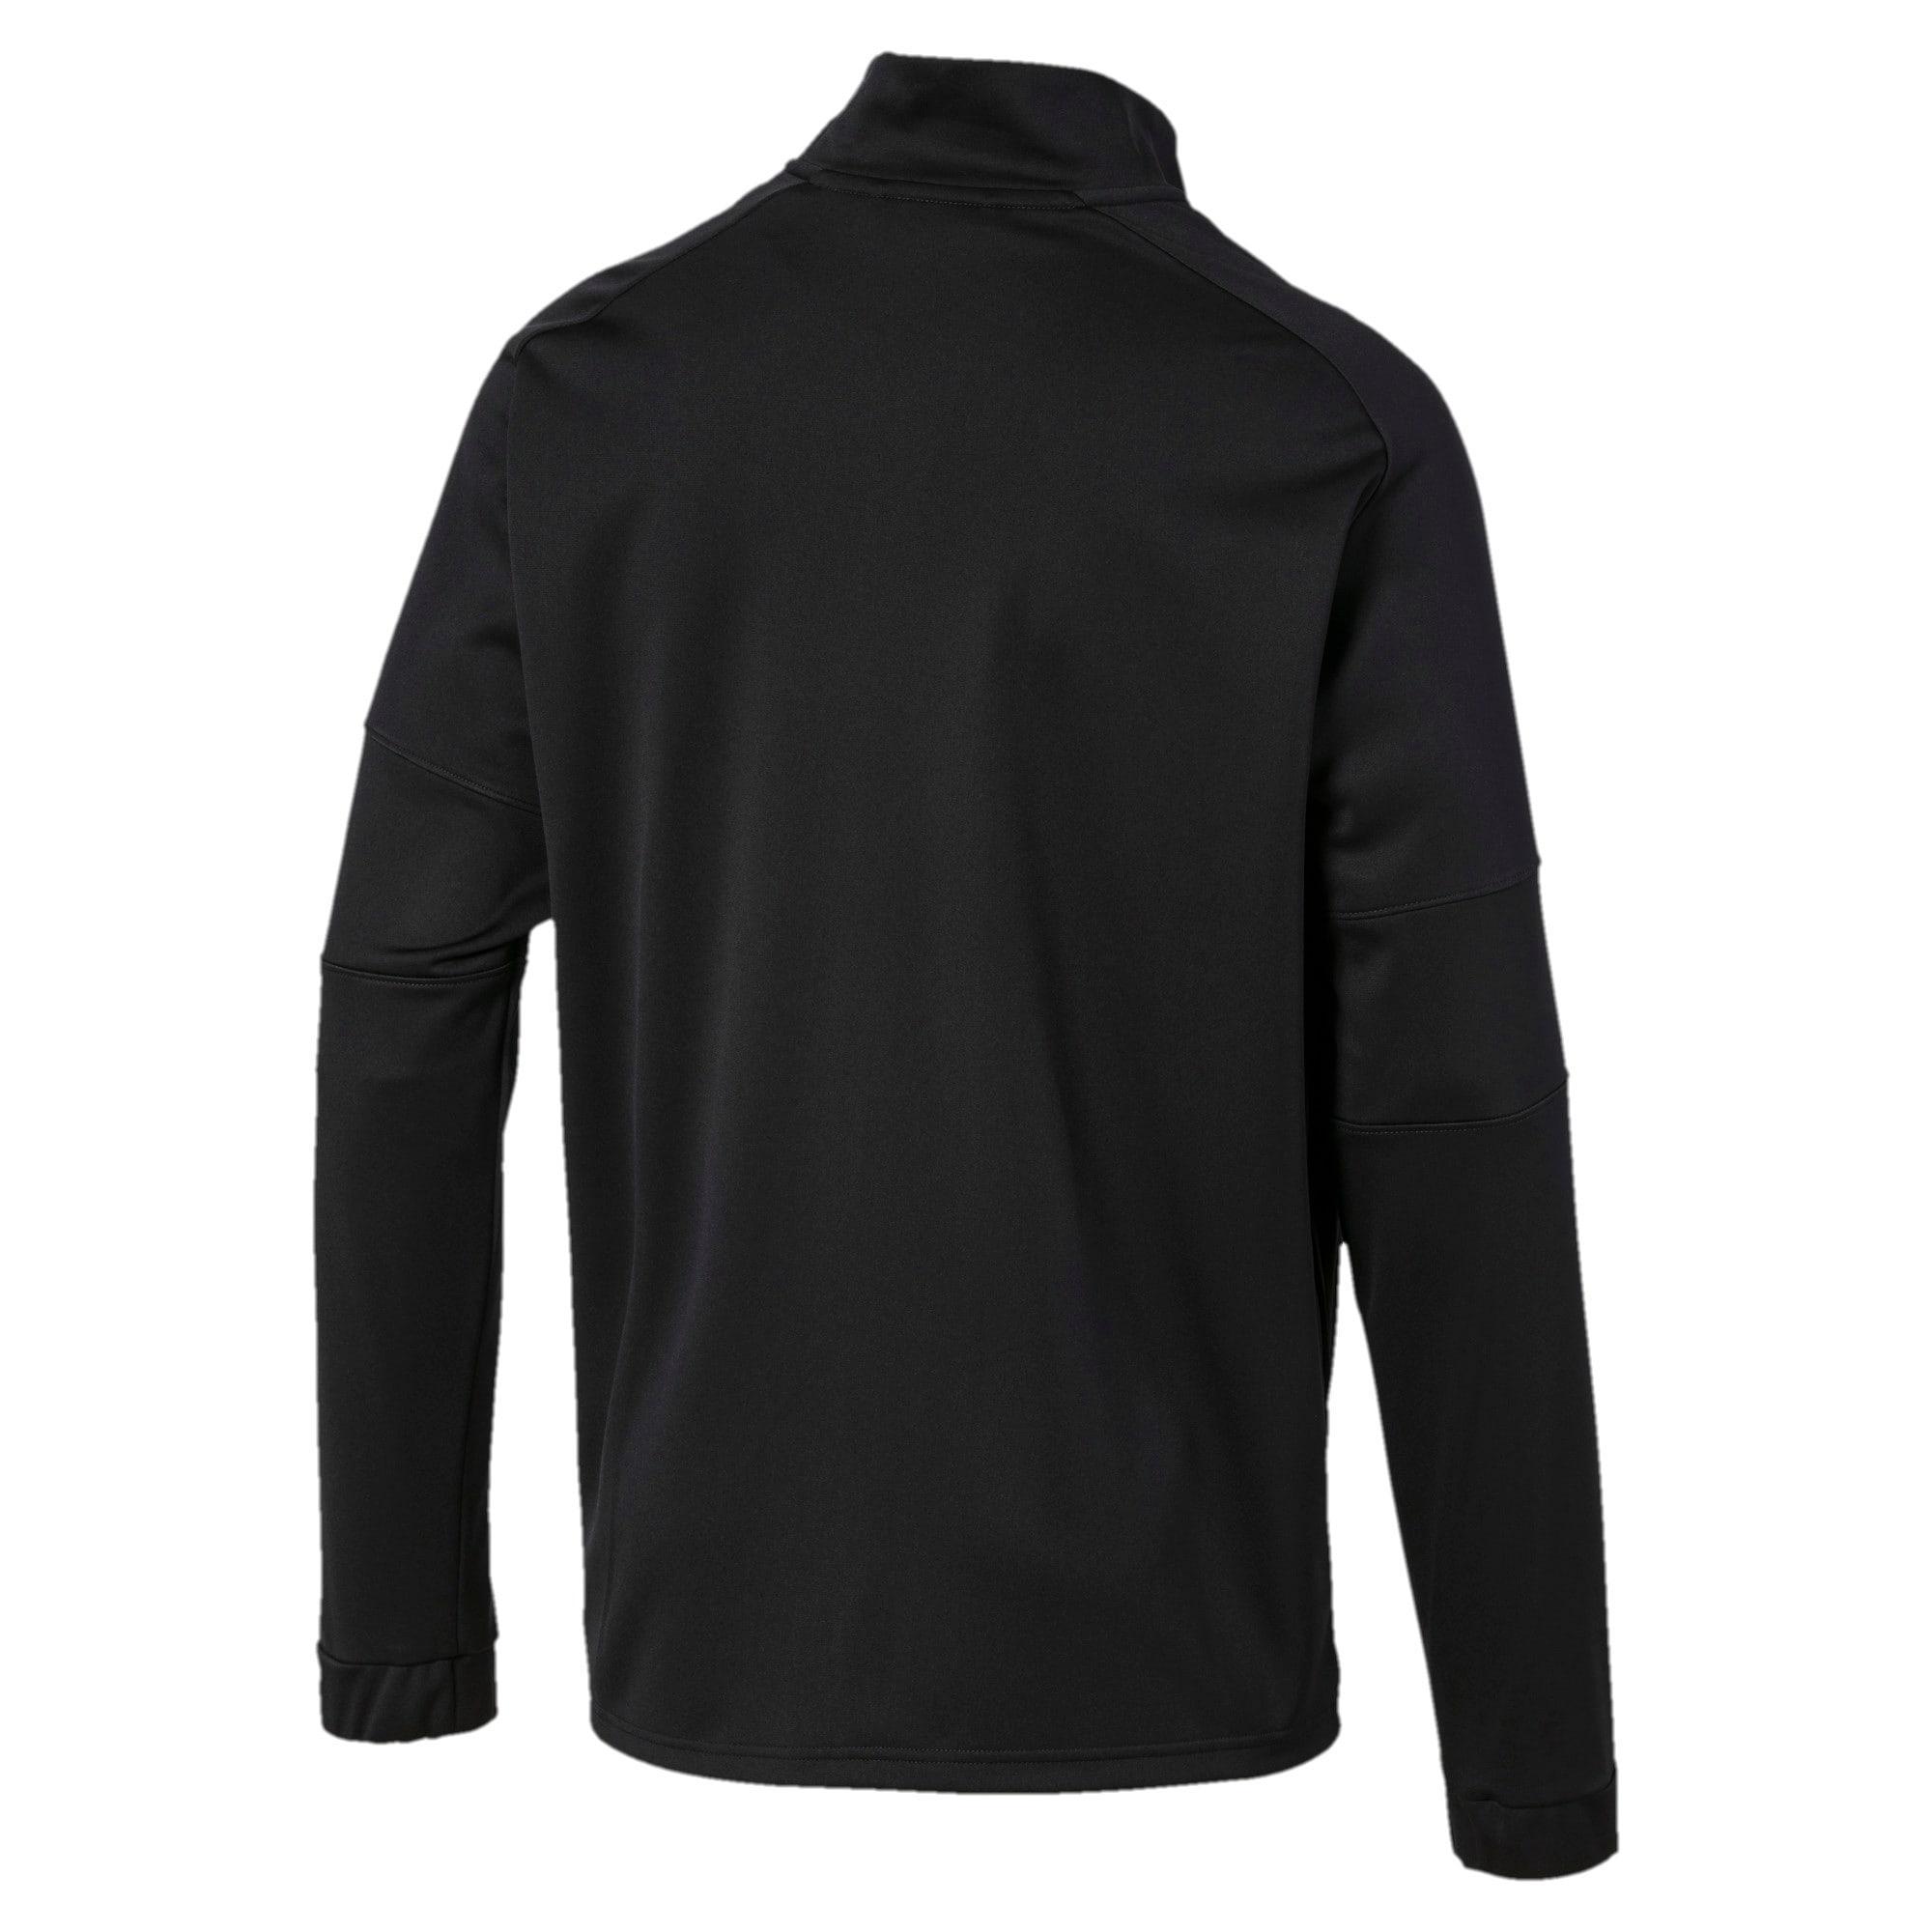 Thumbnail 5 of PUMA Blaster Men's Jacket, Puma Black, medium